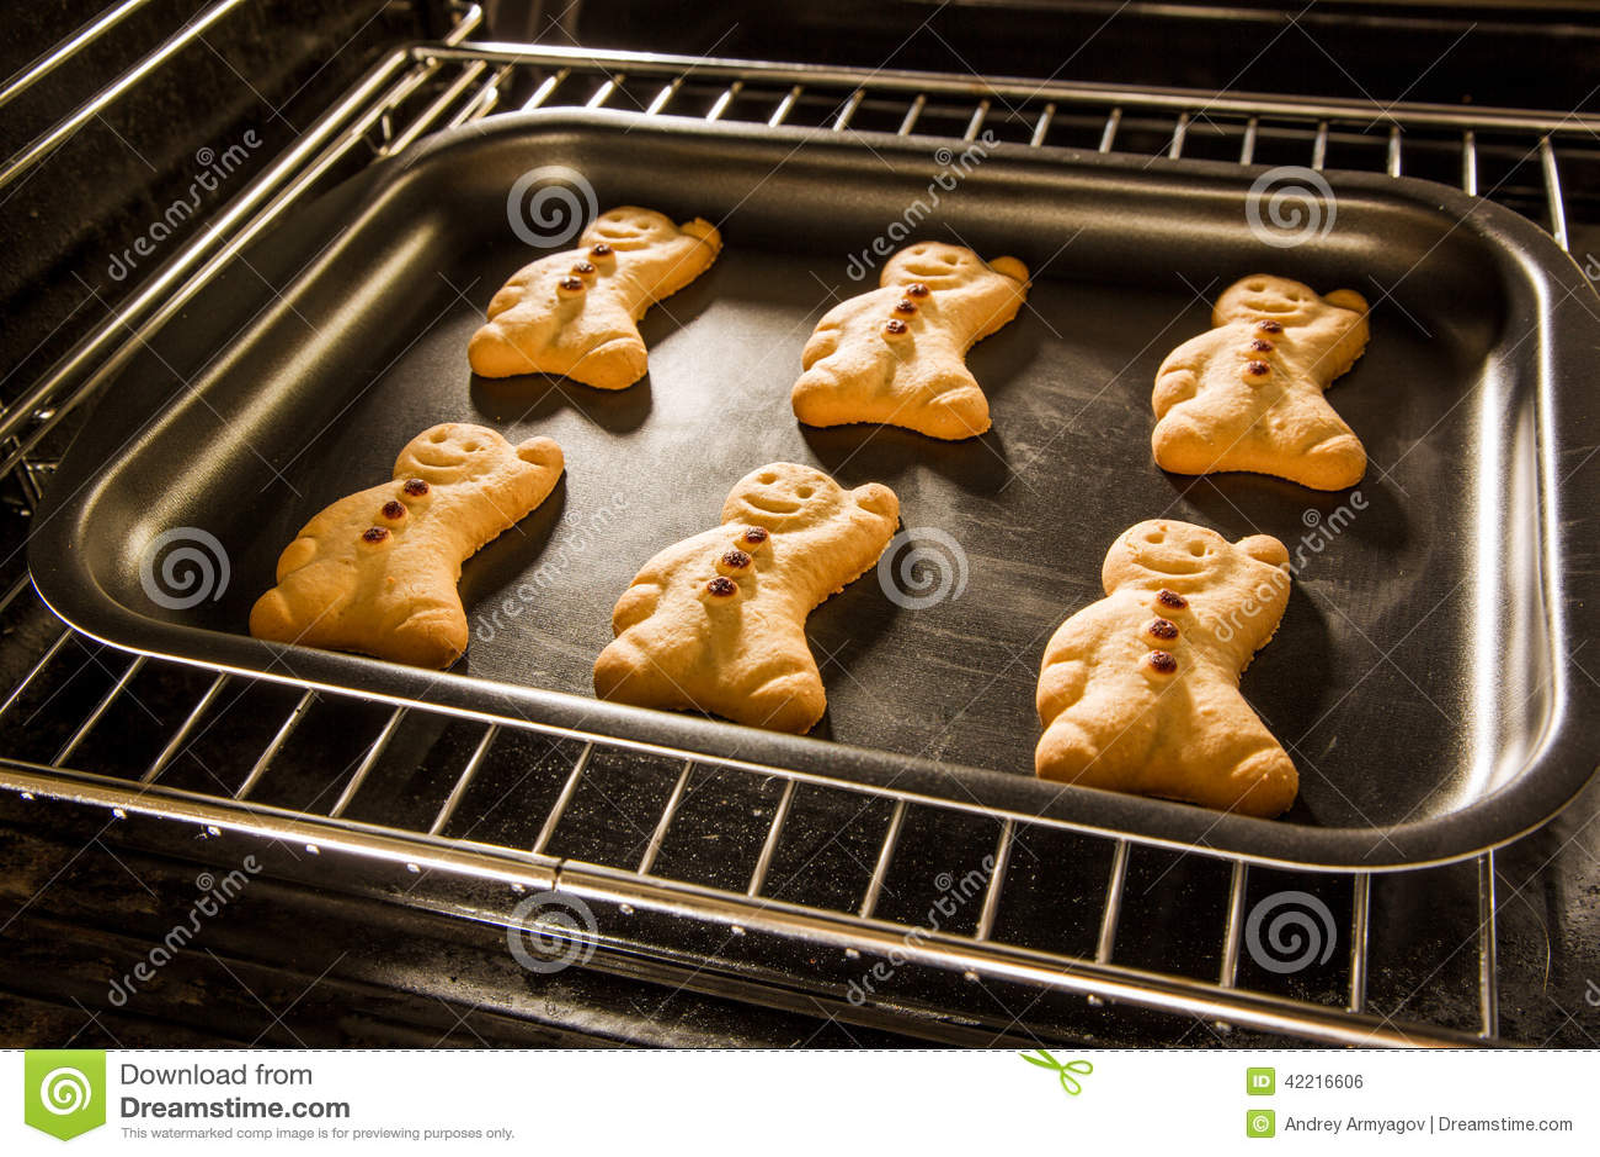 Gingerbread Man Stock Photo - Image: 42216606